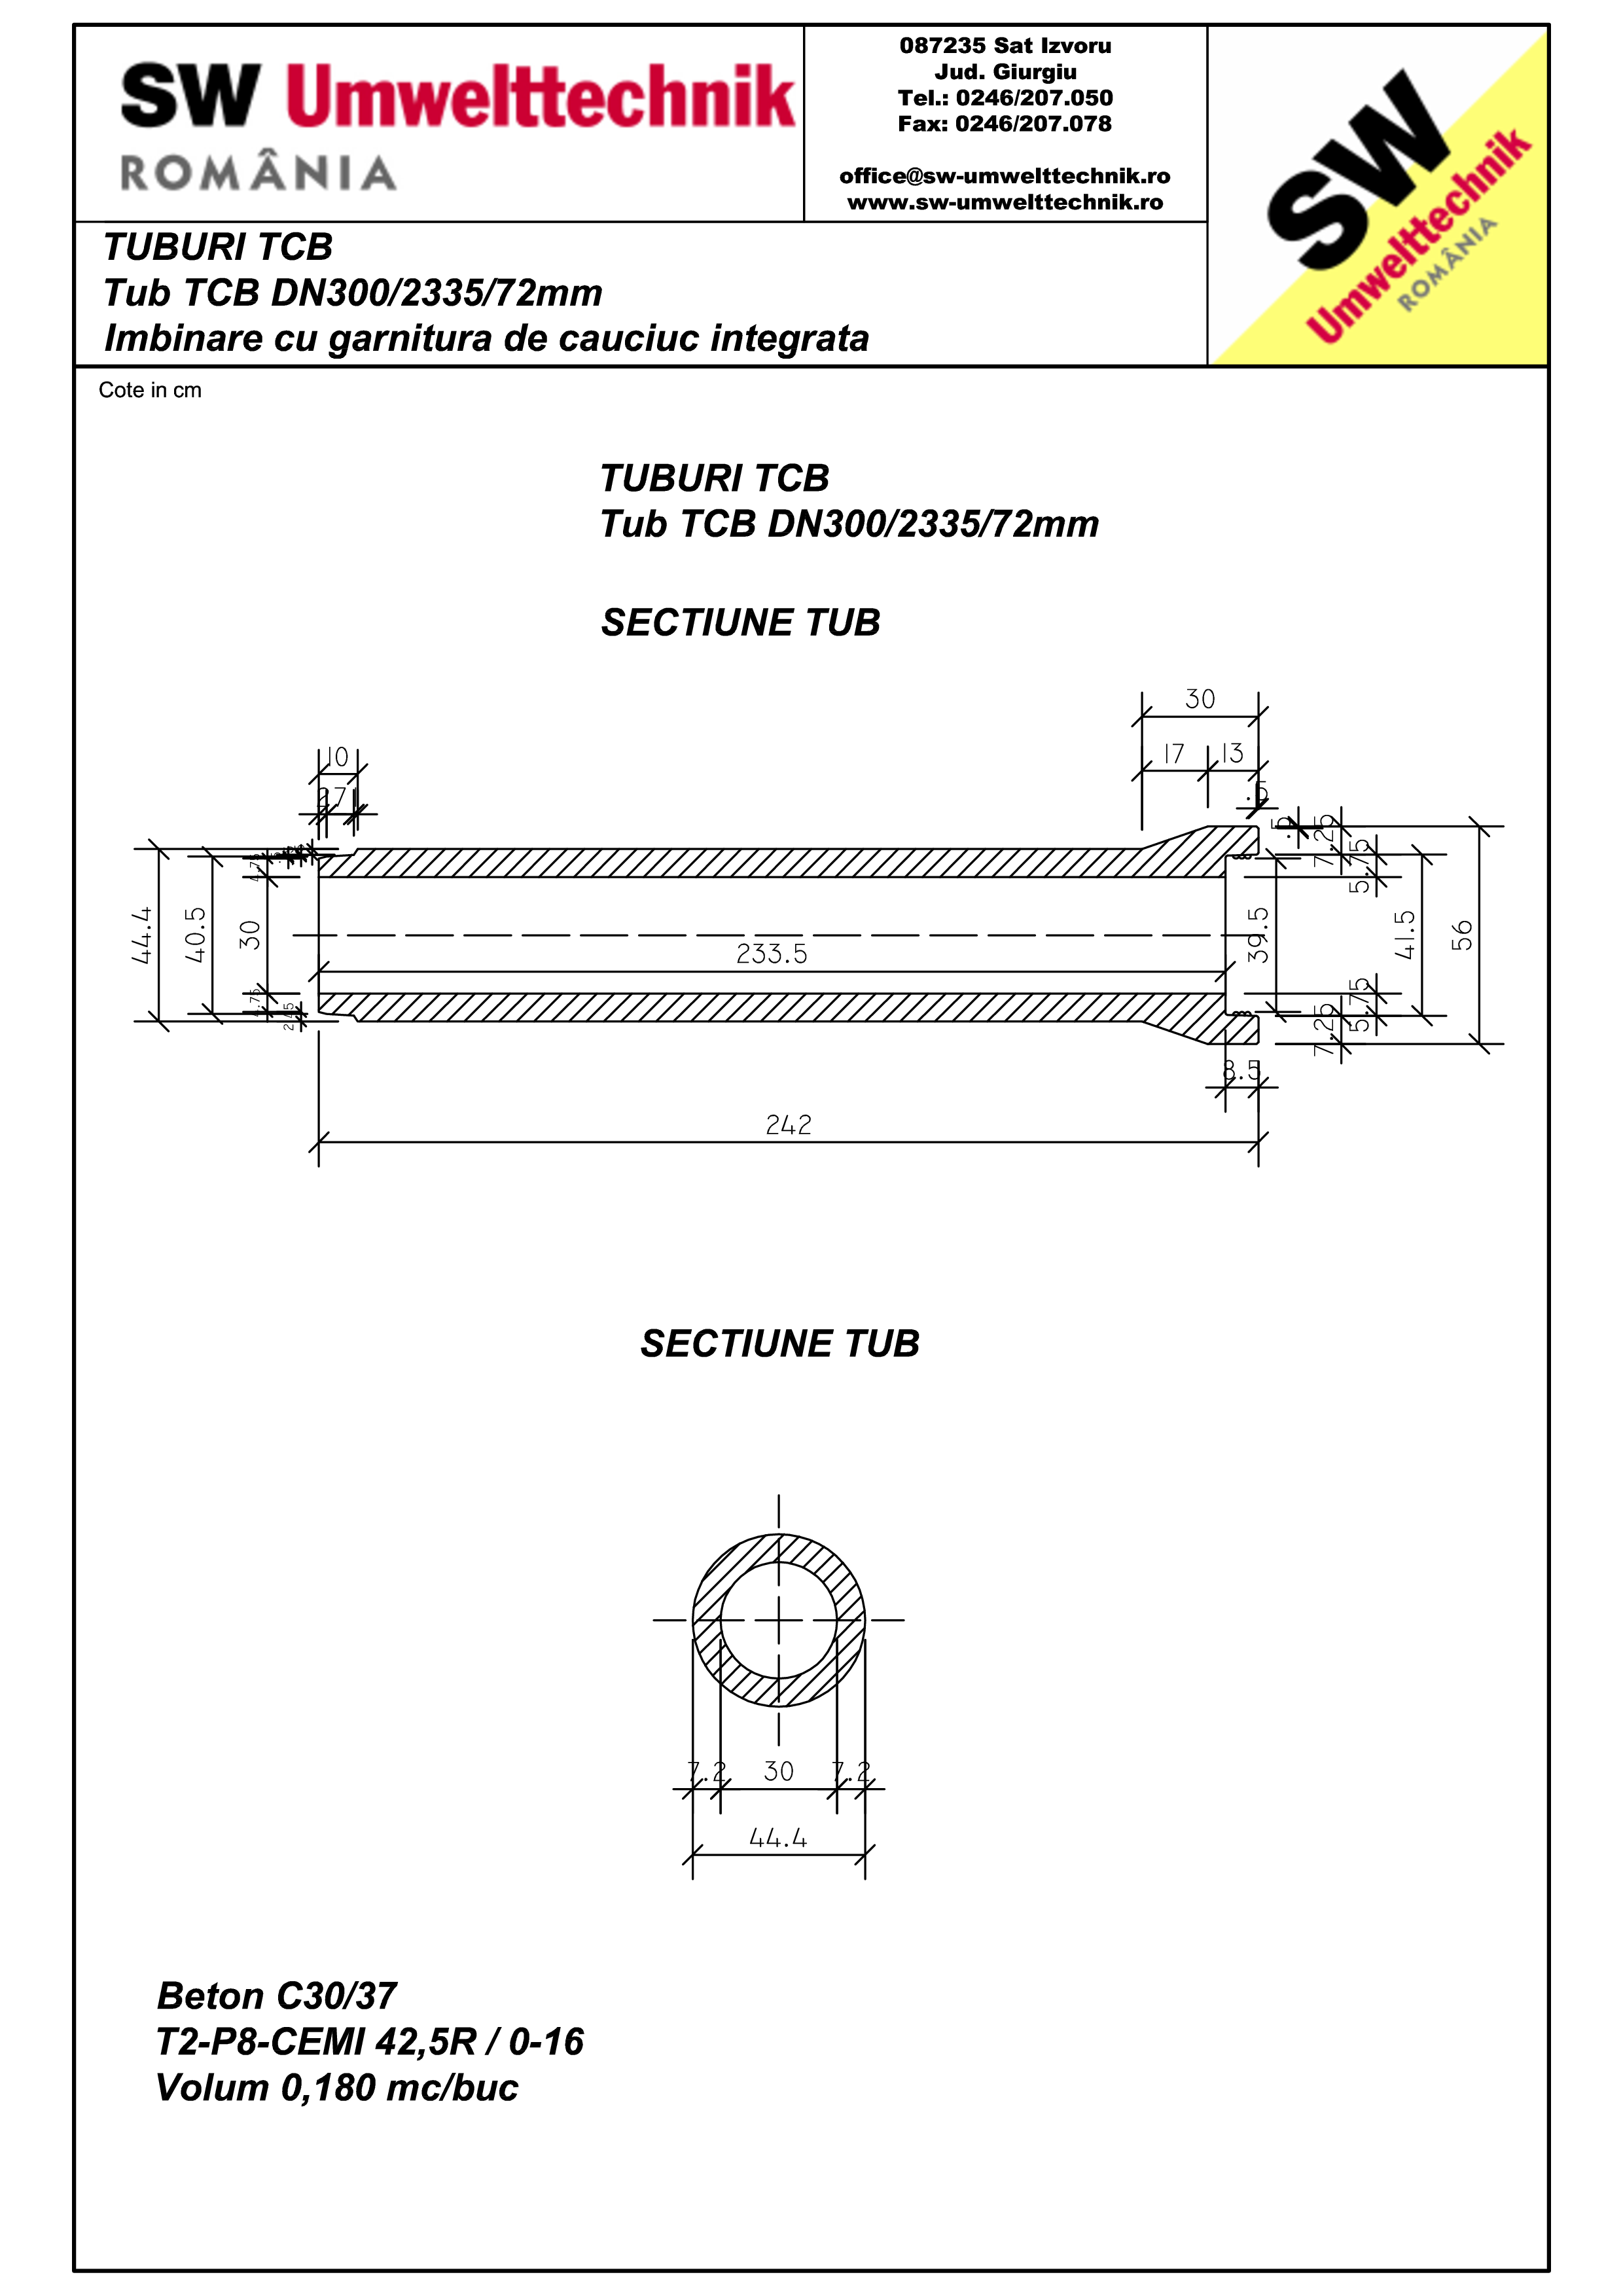 Pagina 1 - CAD-PDF Tub TCB DN300 L2,3m SW UMWELTTECHNIK Detaliu de produs